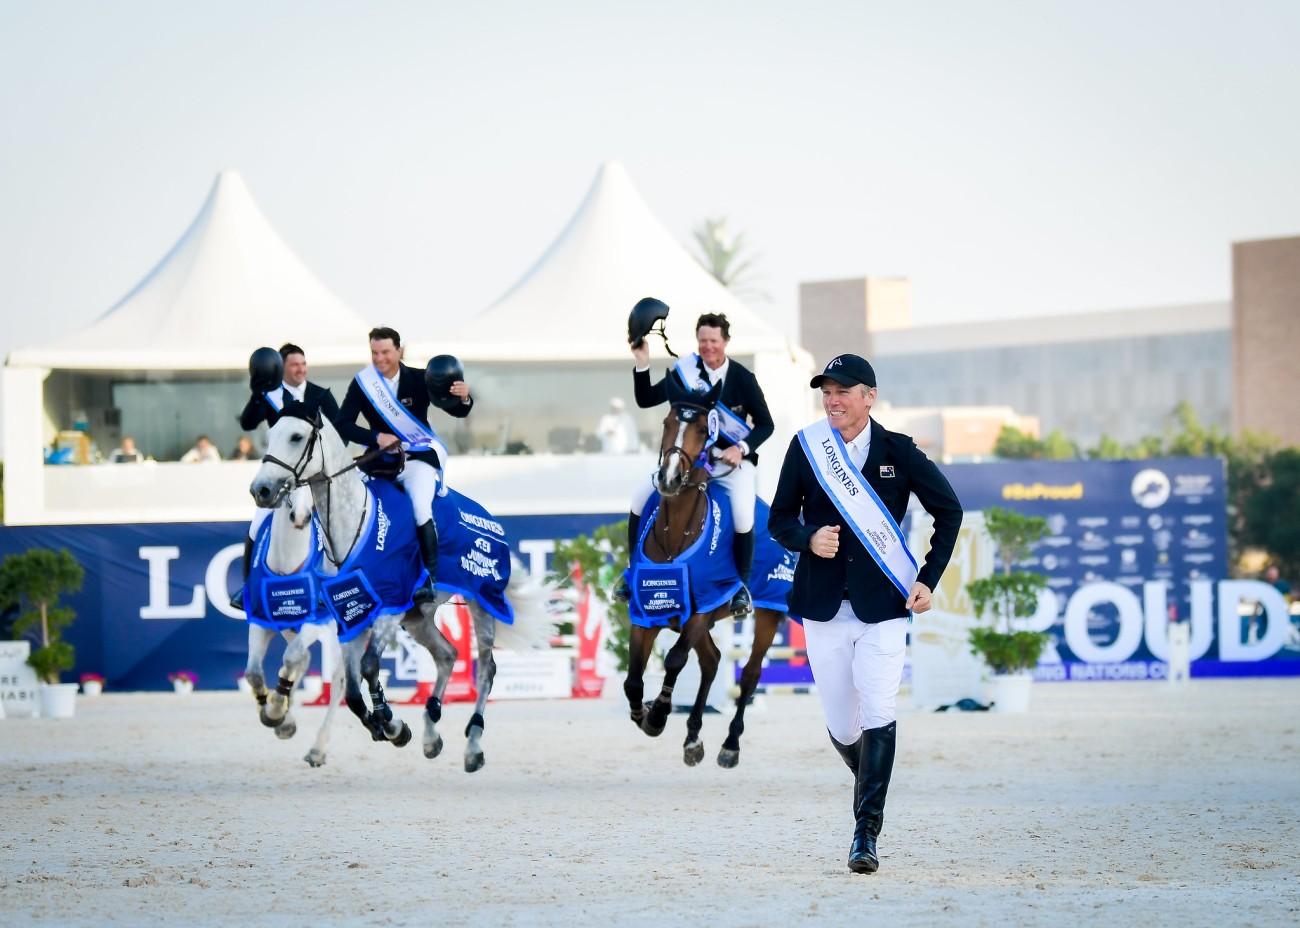 2020.03.01.99.99 Abu Dhabi CSIO 5 FEI NC Team New Zealand FEI Helen Cruden